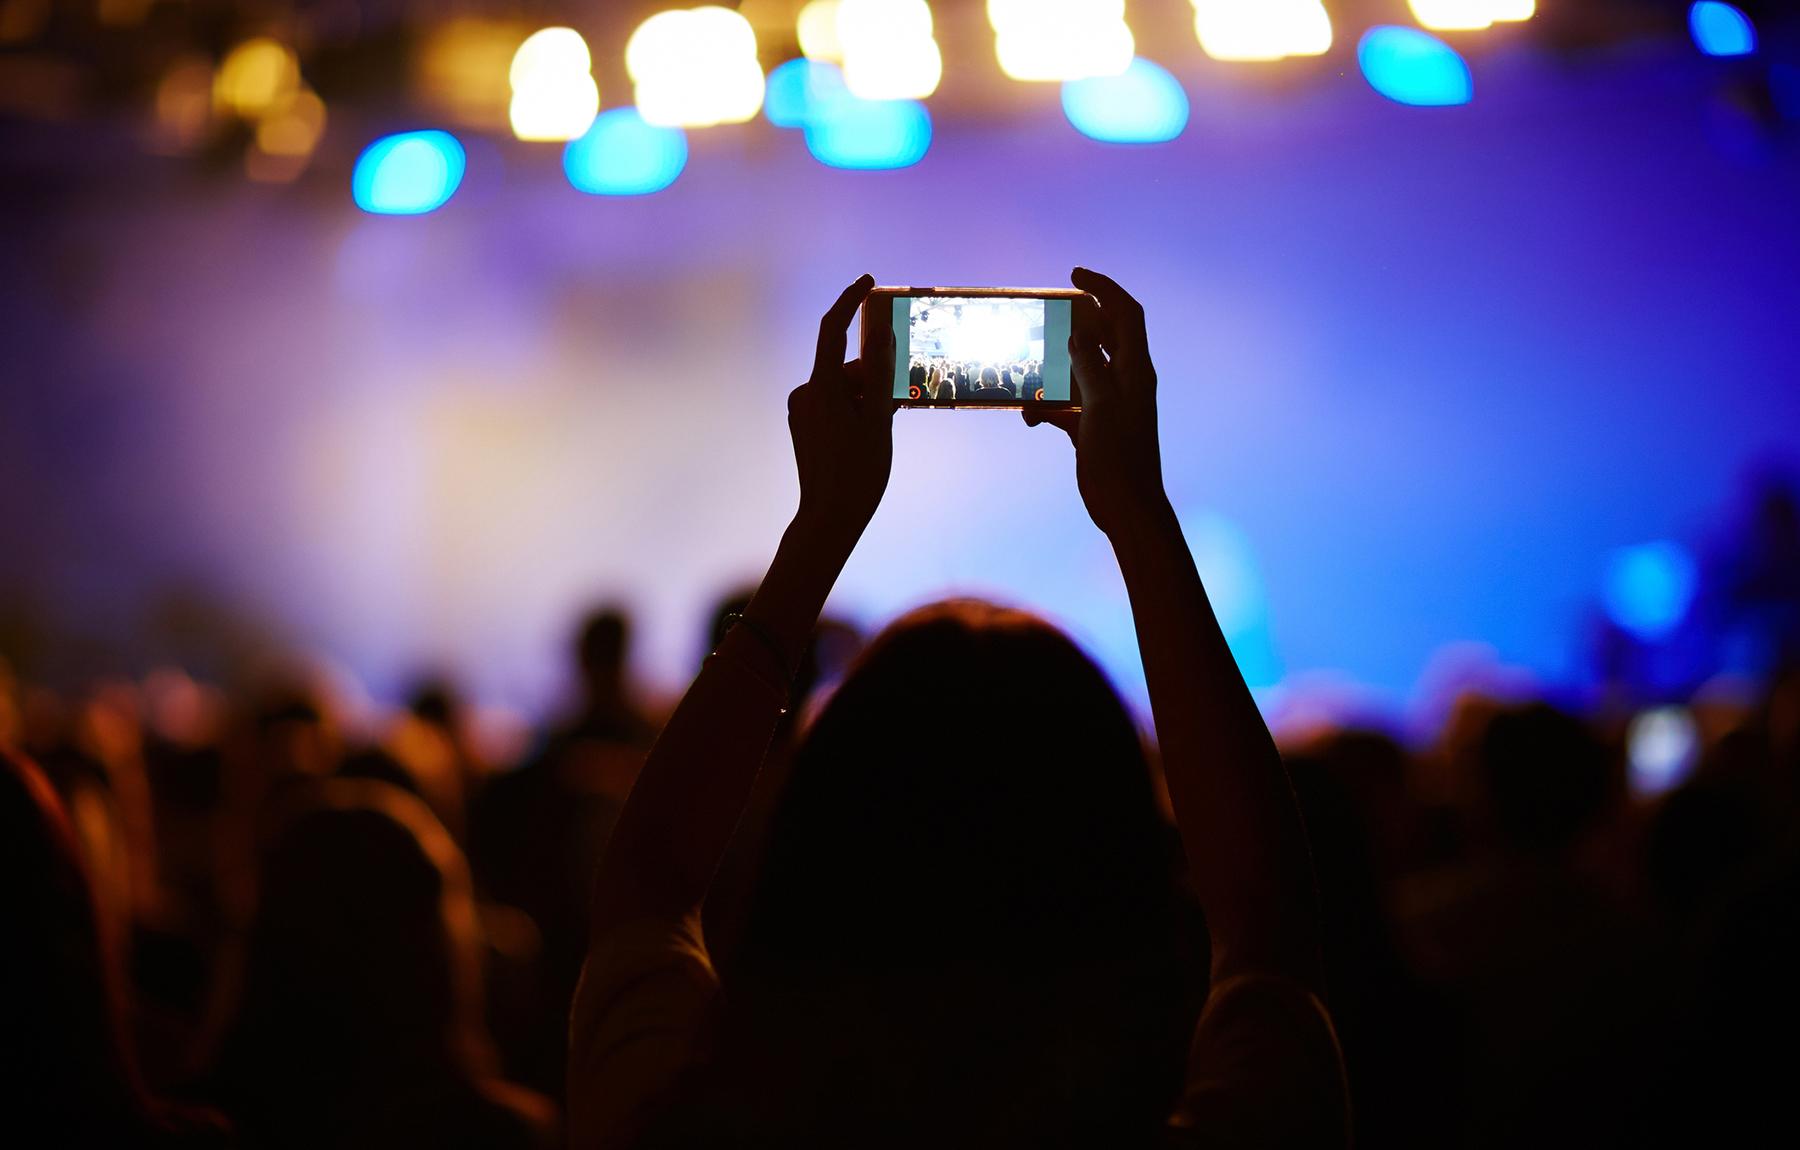 Keeping Track of Orange Conference 2018 on Social Media